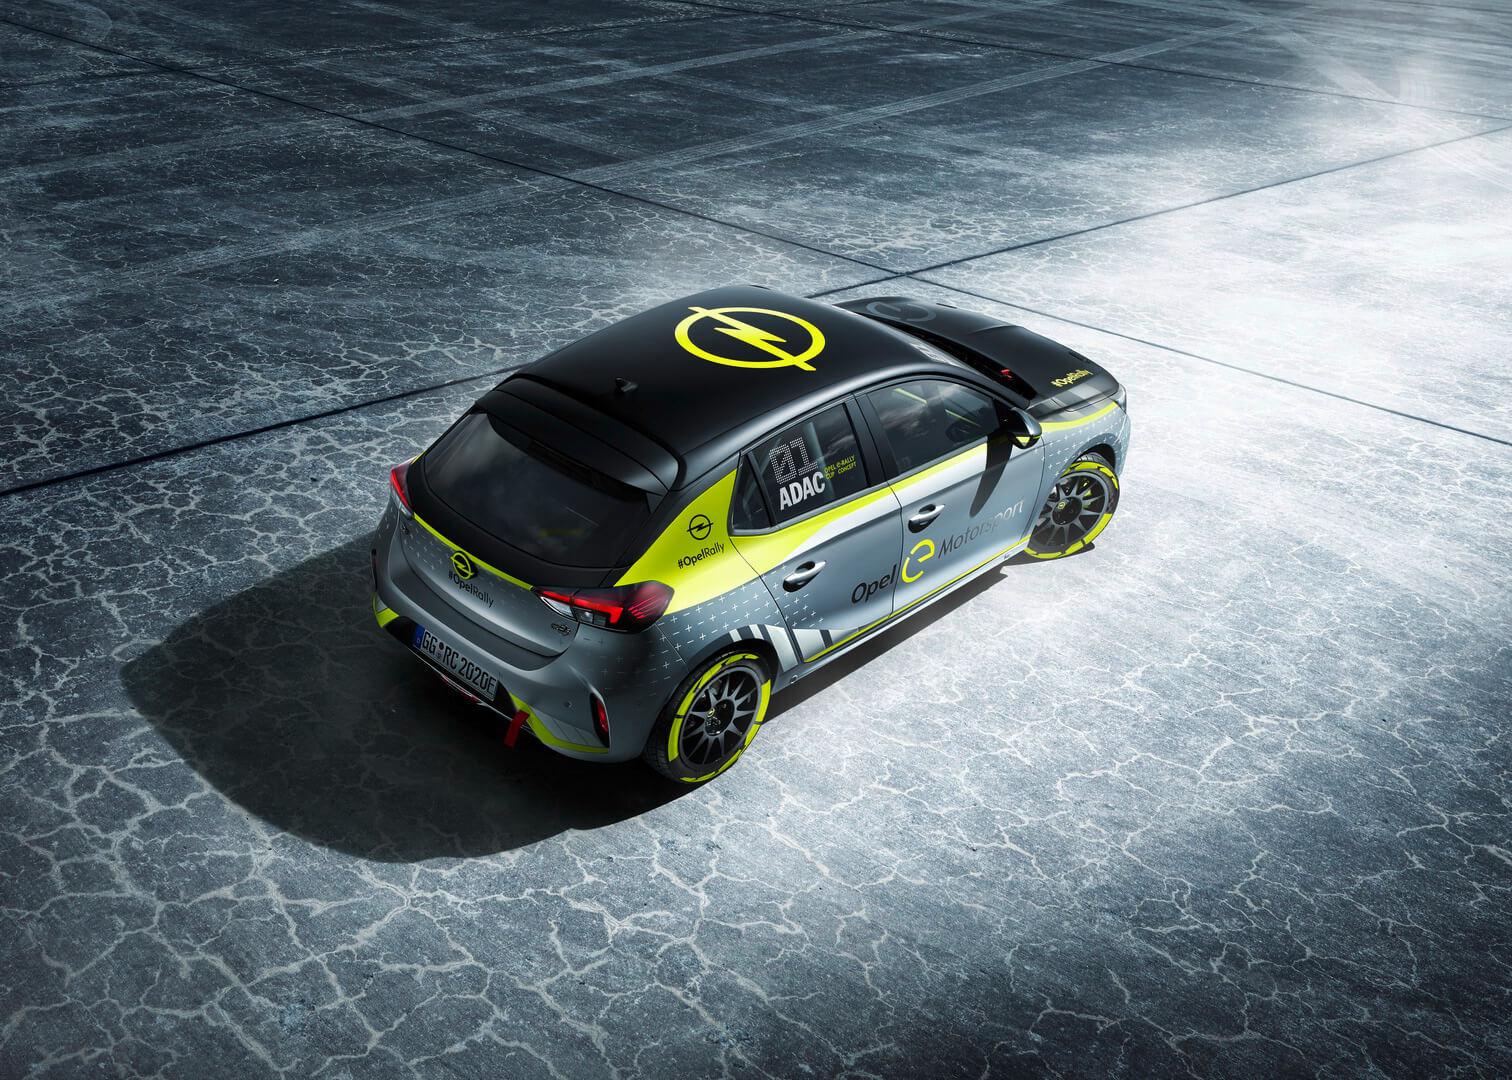 Раллийный электромобиль Opel Corsa-e